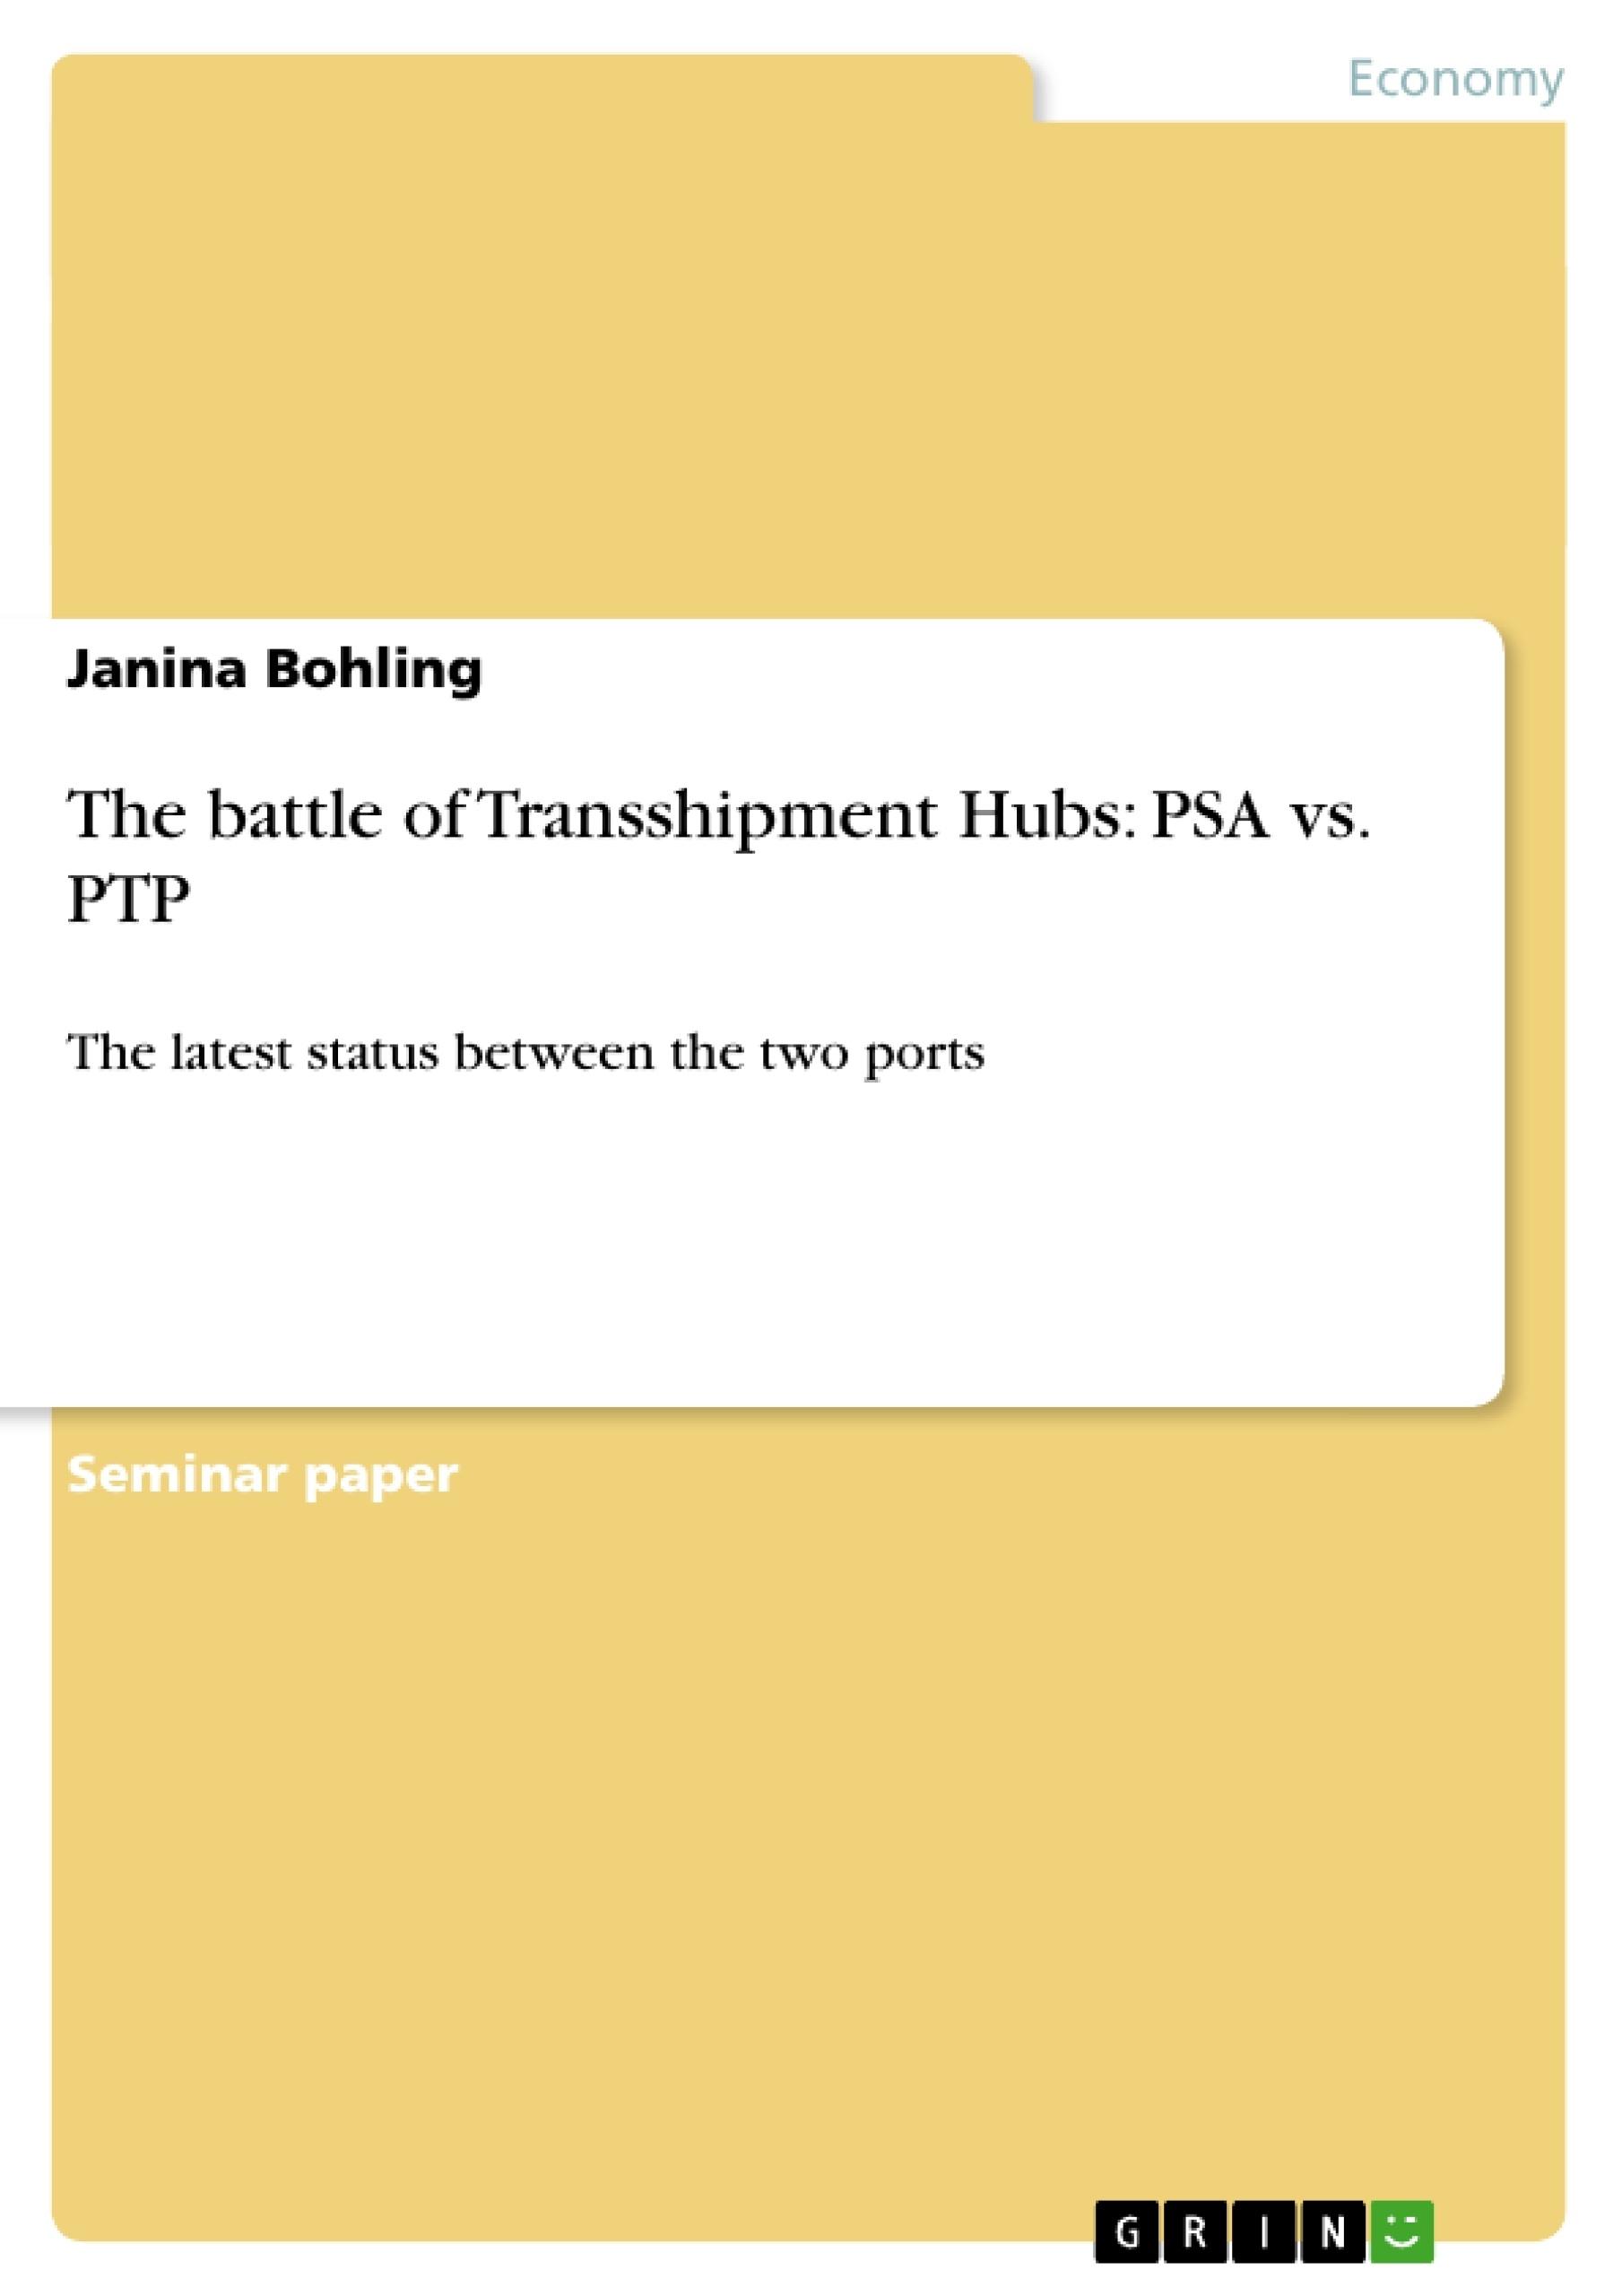 The battle of the asian transshipment hubs psa versus ptp